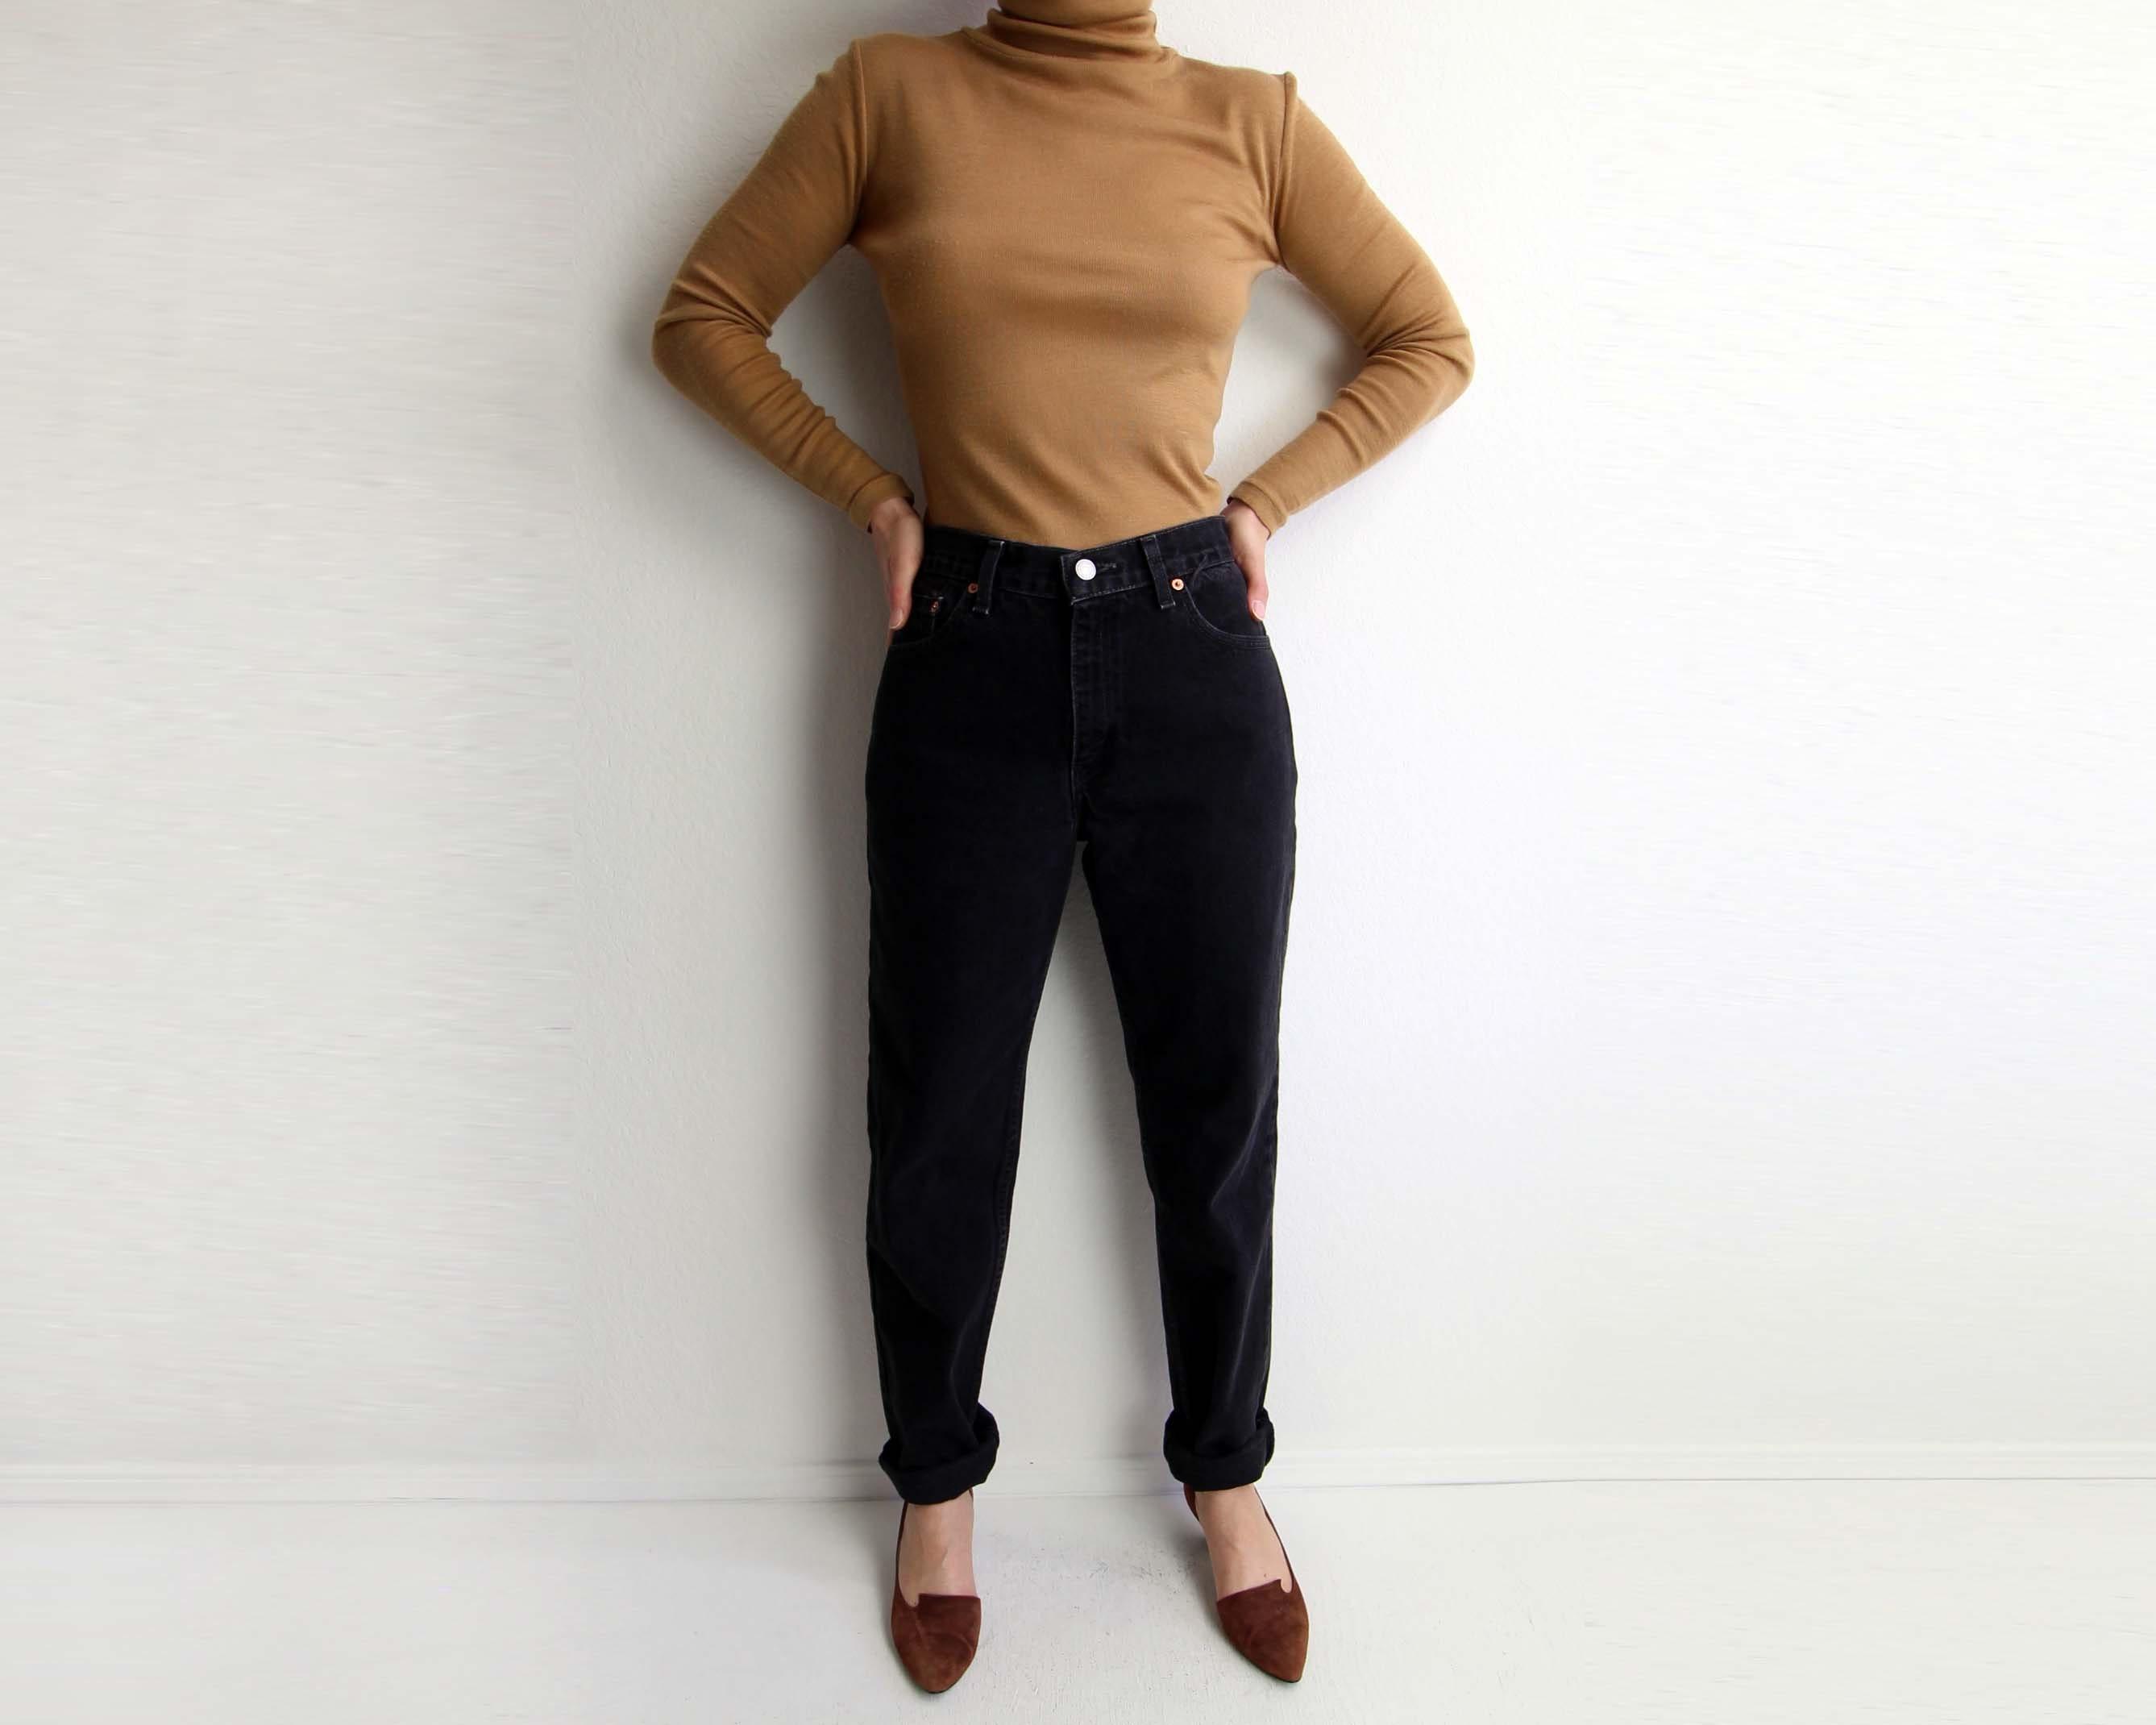 a5e36c48eff VINTAGE Levis Jeans 512 Black Denim Tapered Leg High Waist Made in USA  Womens Medium 27 Waist. gallery photo ...